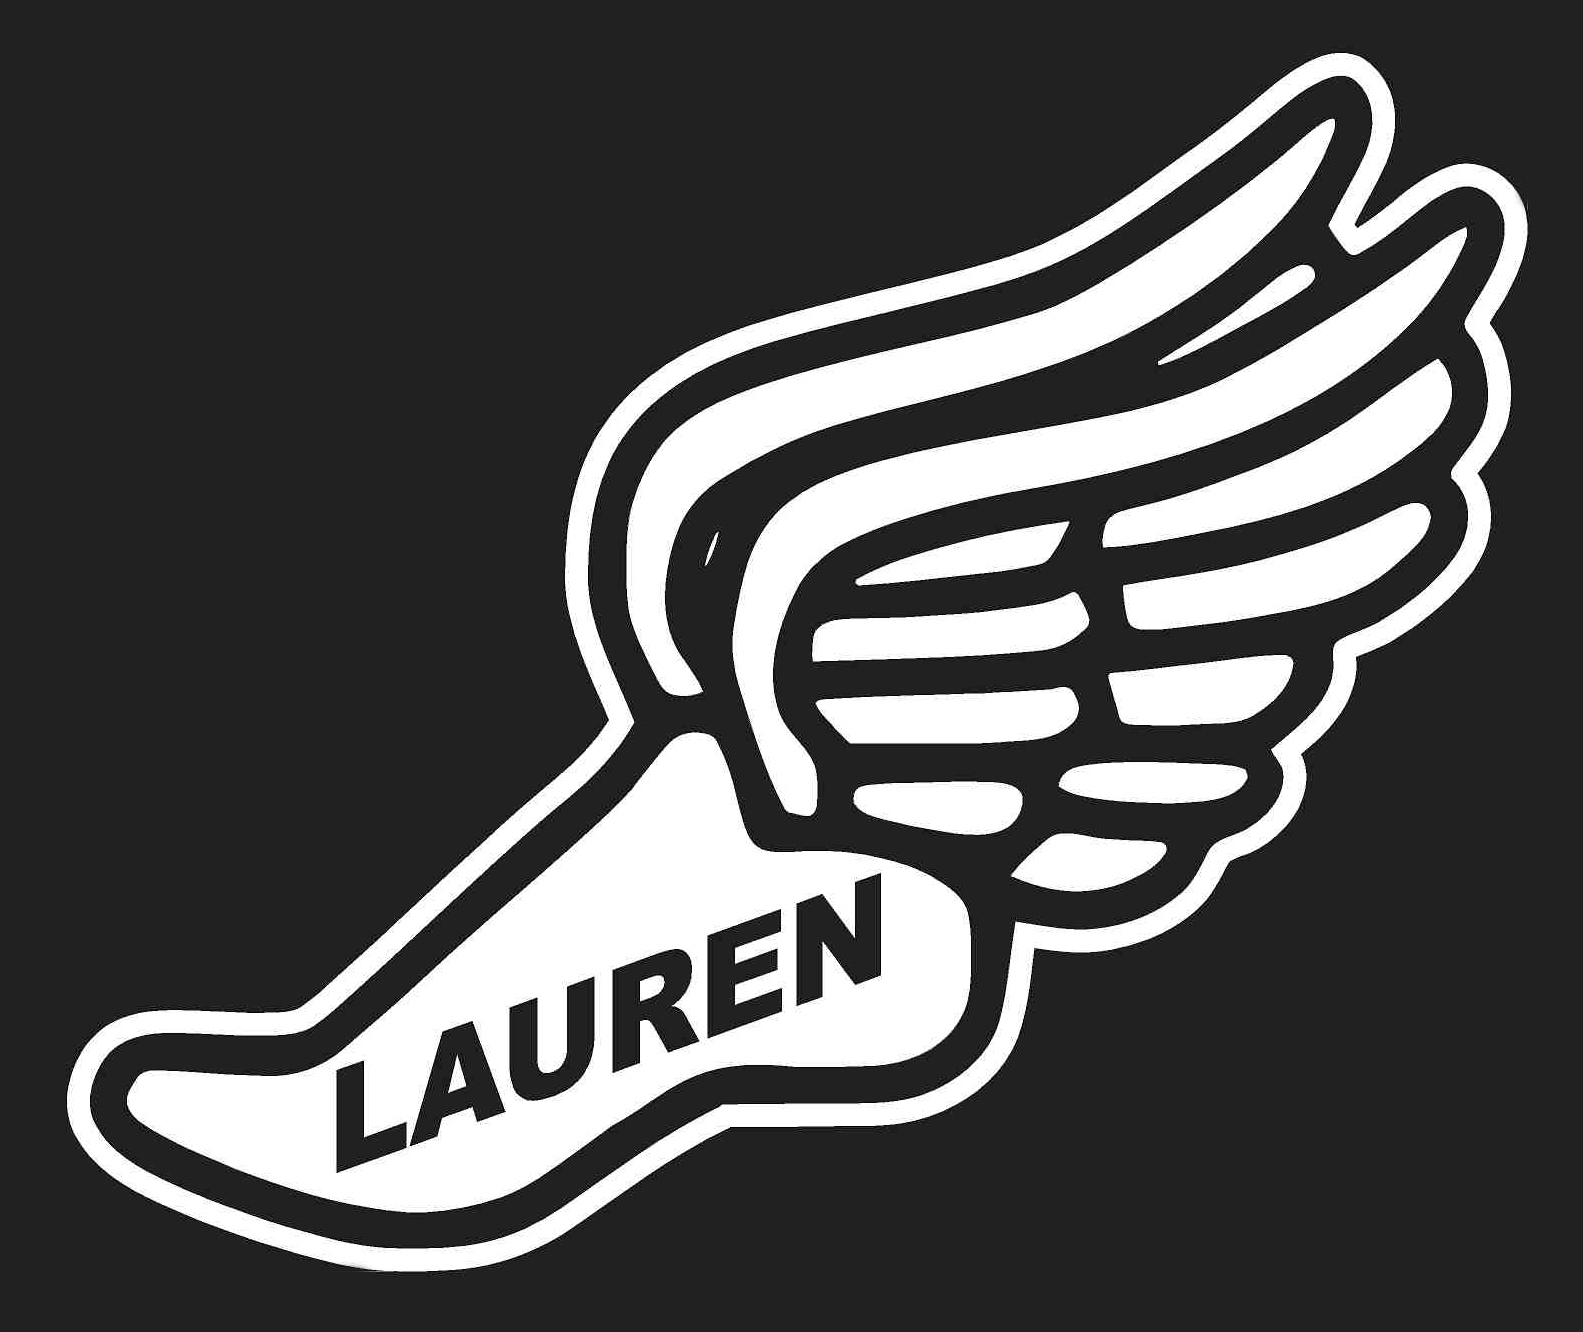 mccluskey winged foot logo.jpg